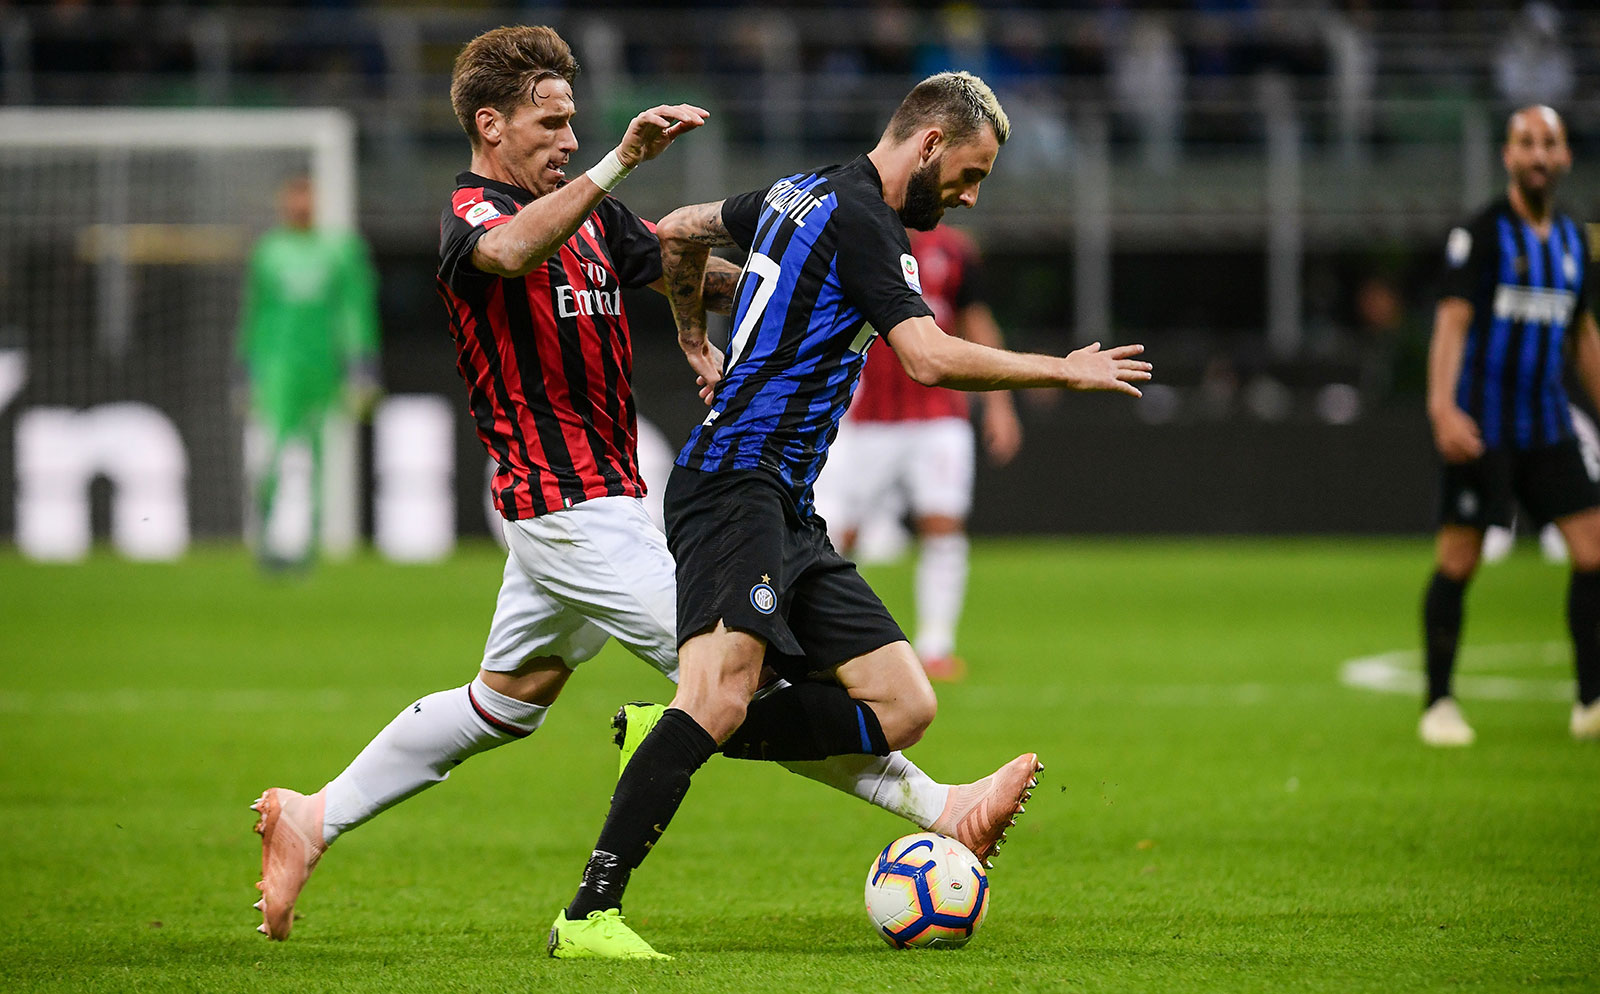 Lucas Biglia and Marcelo Brozović during Inter-Milan at Stadio San Siro on October 21, 2018. (MARCO BERTORELLO/AFP/Getty Images)